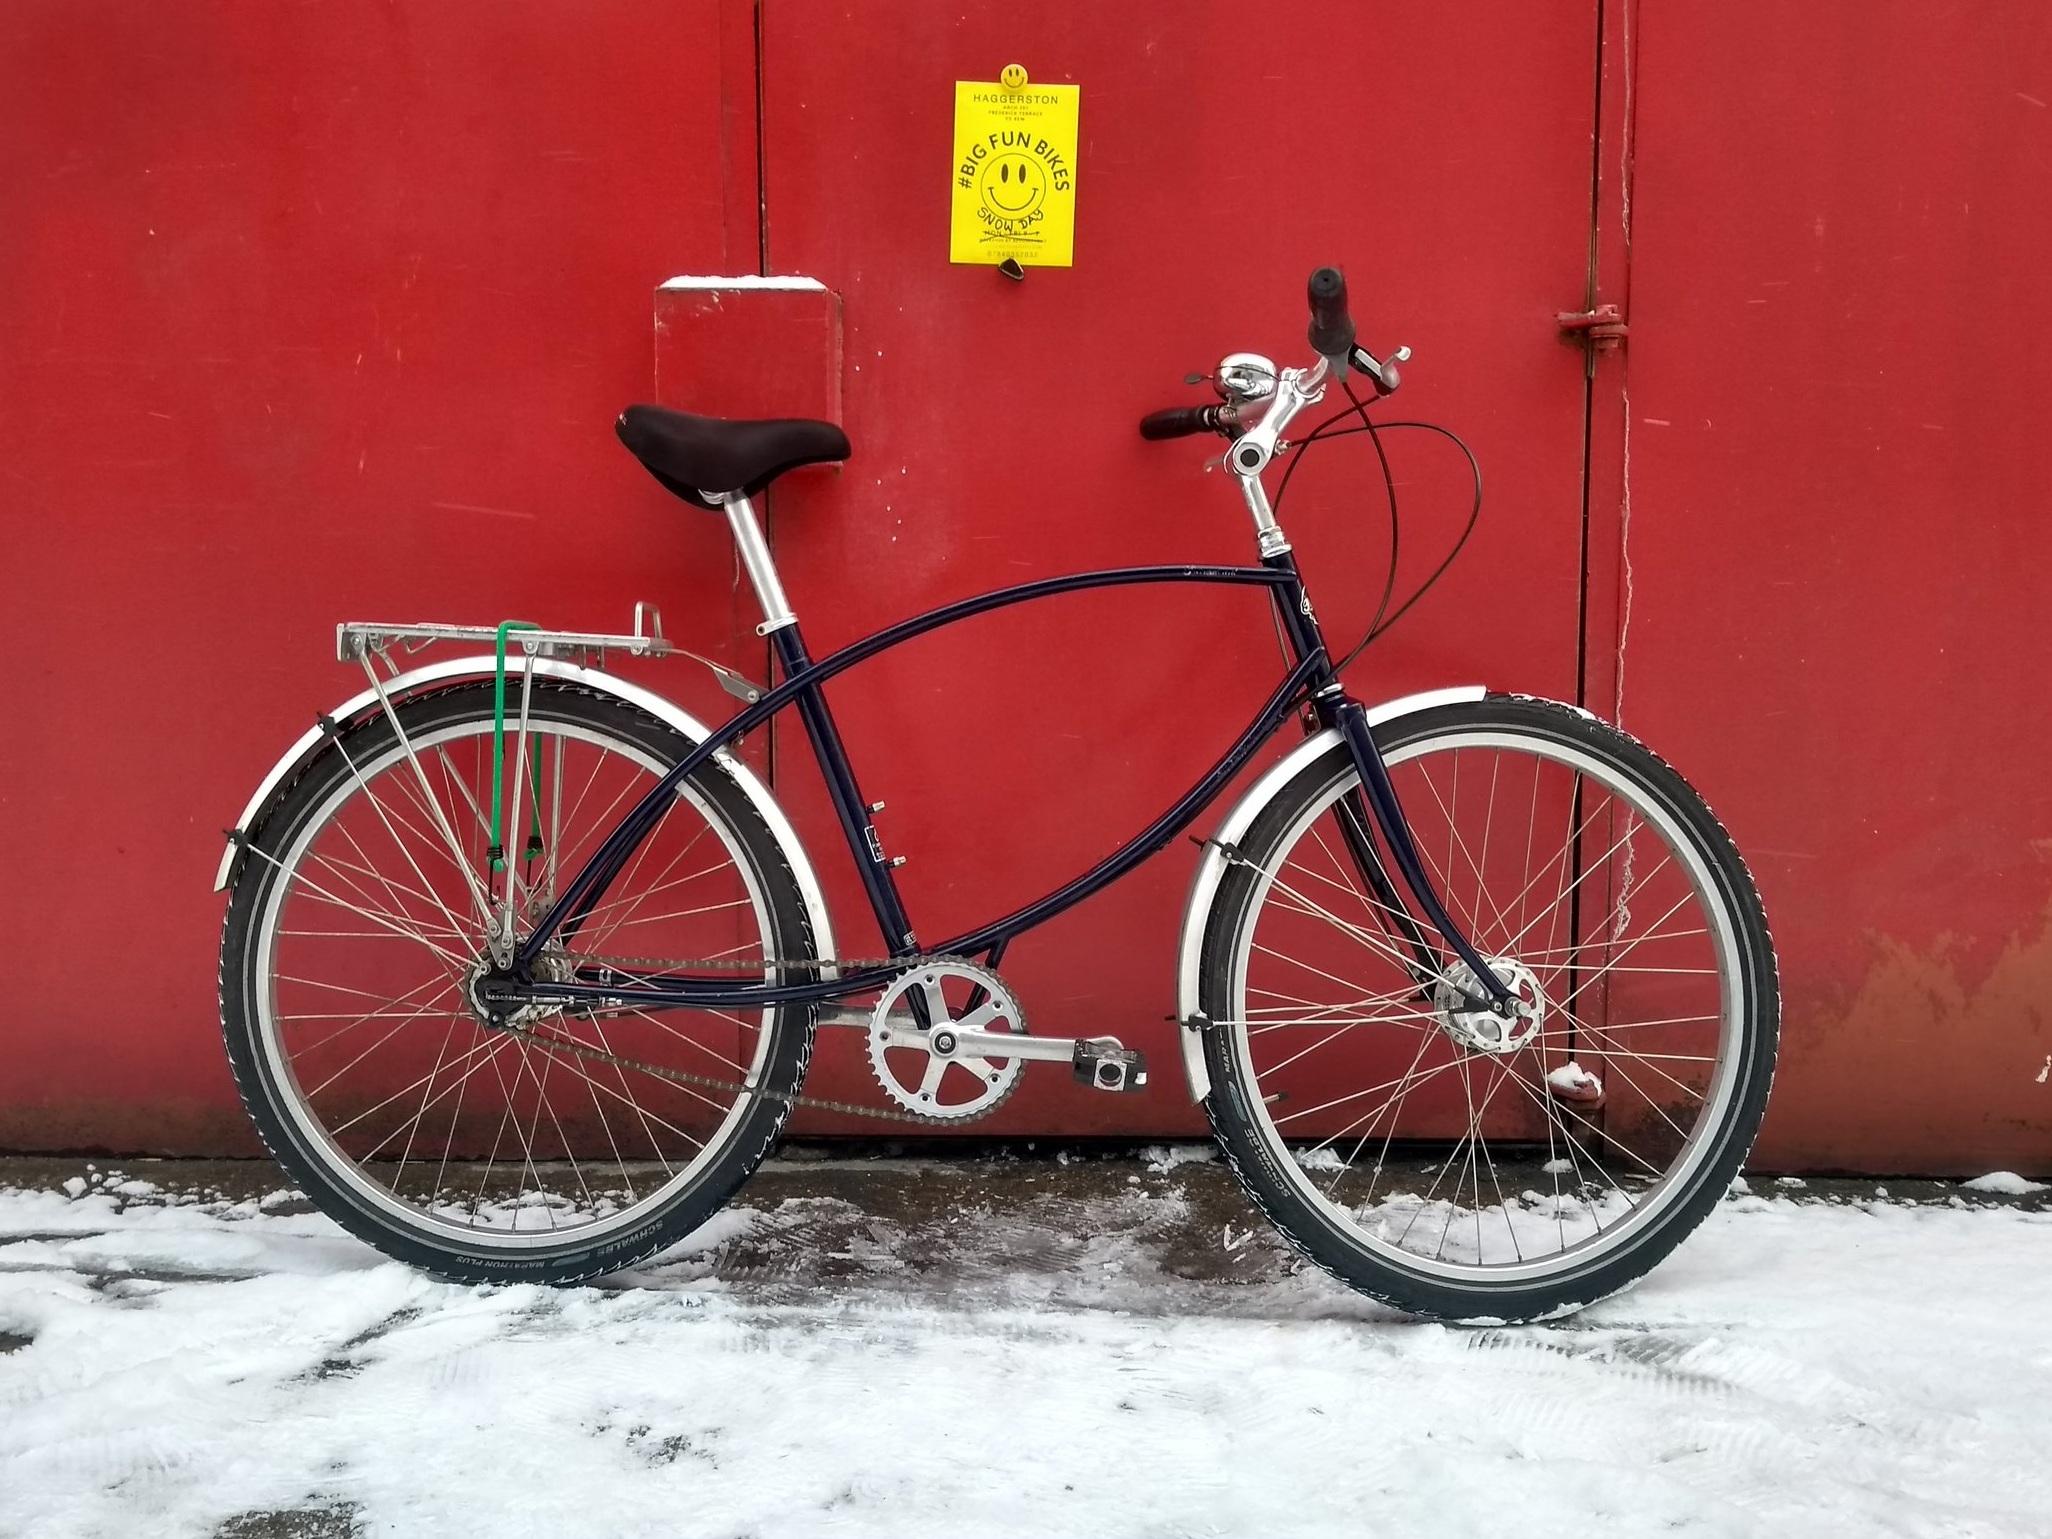 refurbished-bicycles-london.jpg